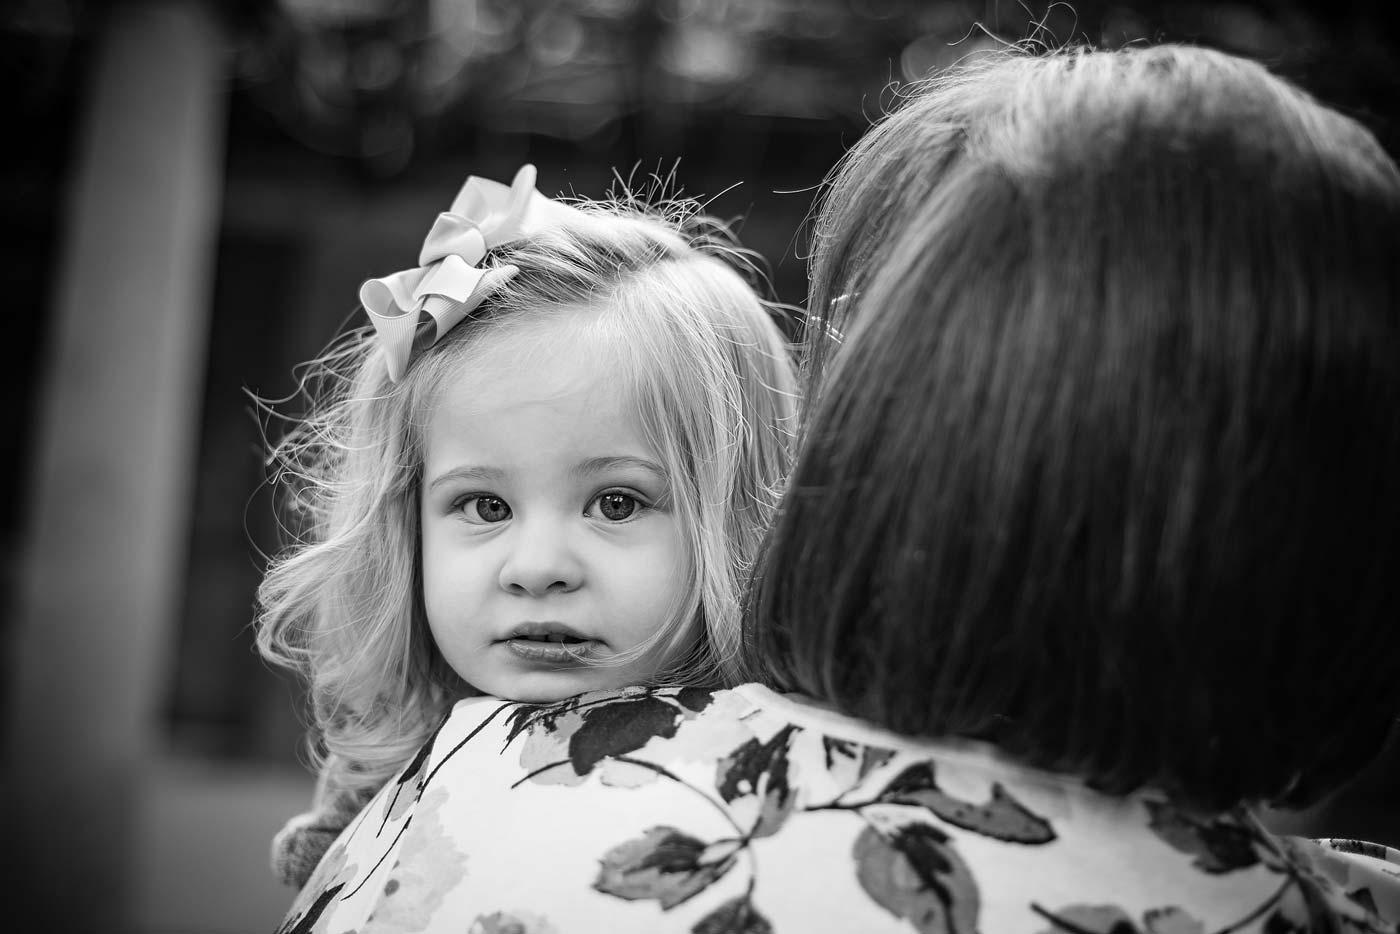 sMiss-Emma-and-Family---2-Years---Jan-2016-100.jpg